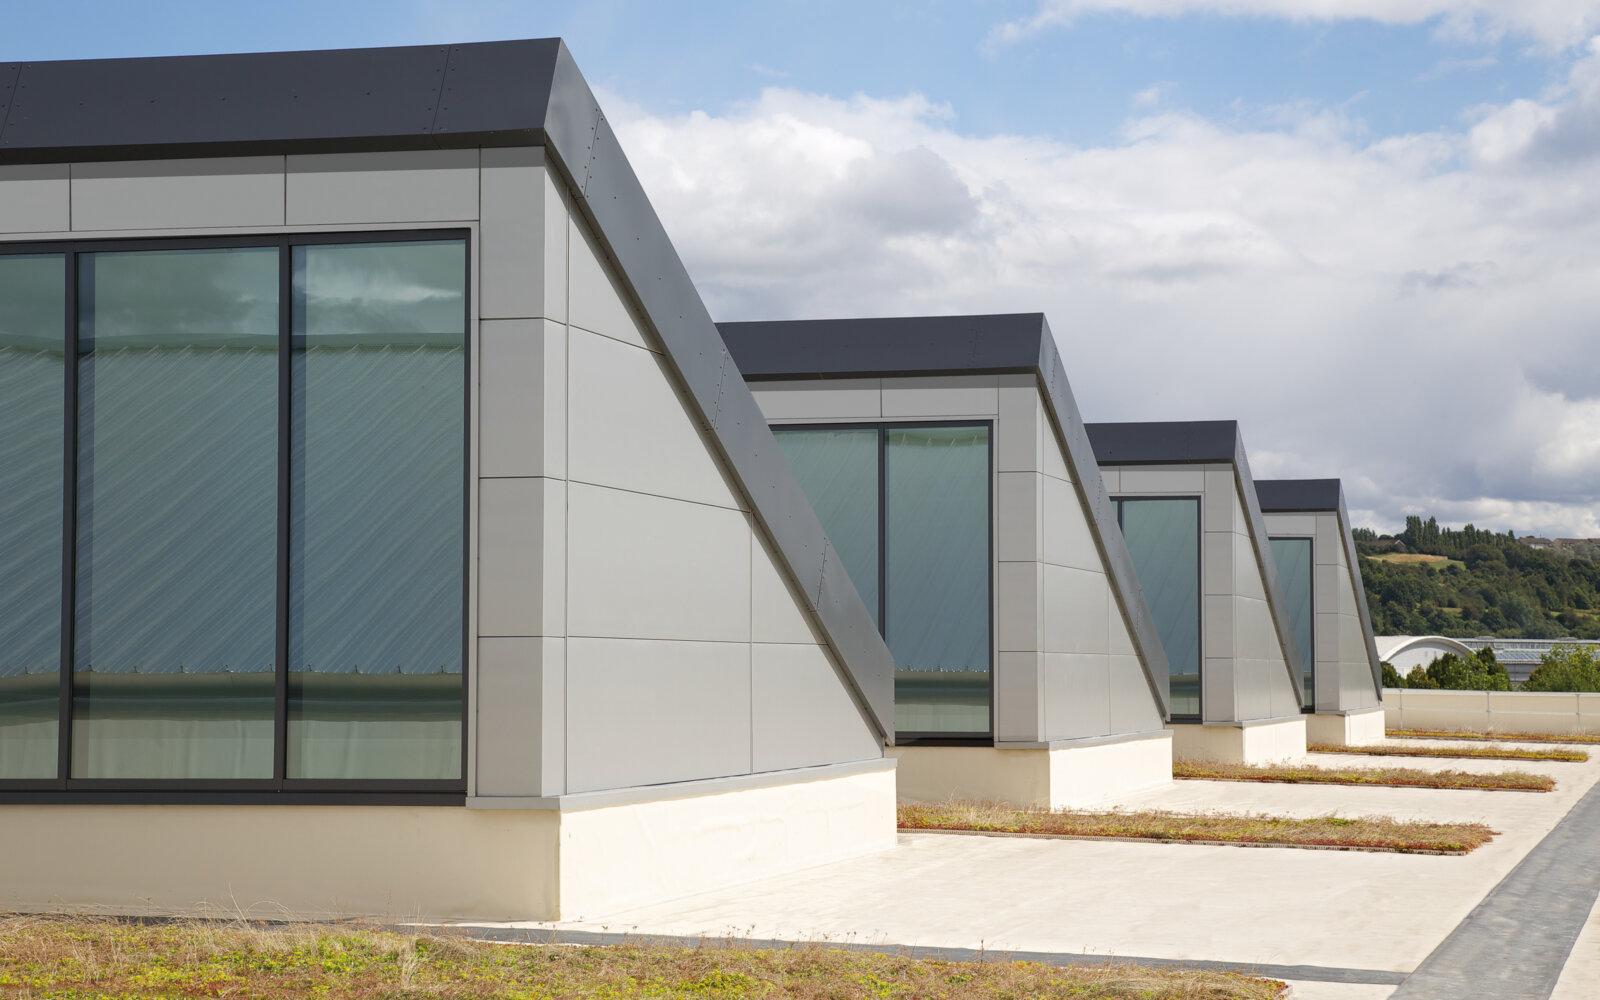 Munroe Court, Munroe K Ltd - Roof